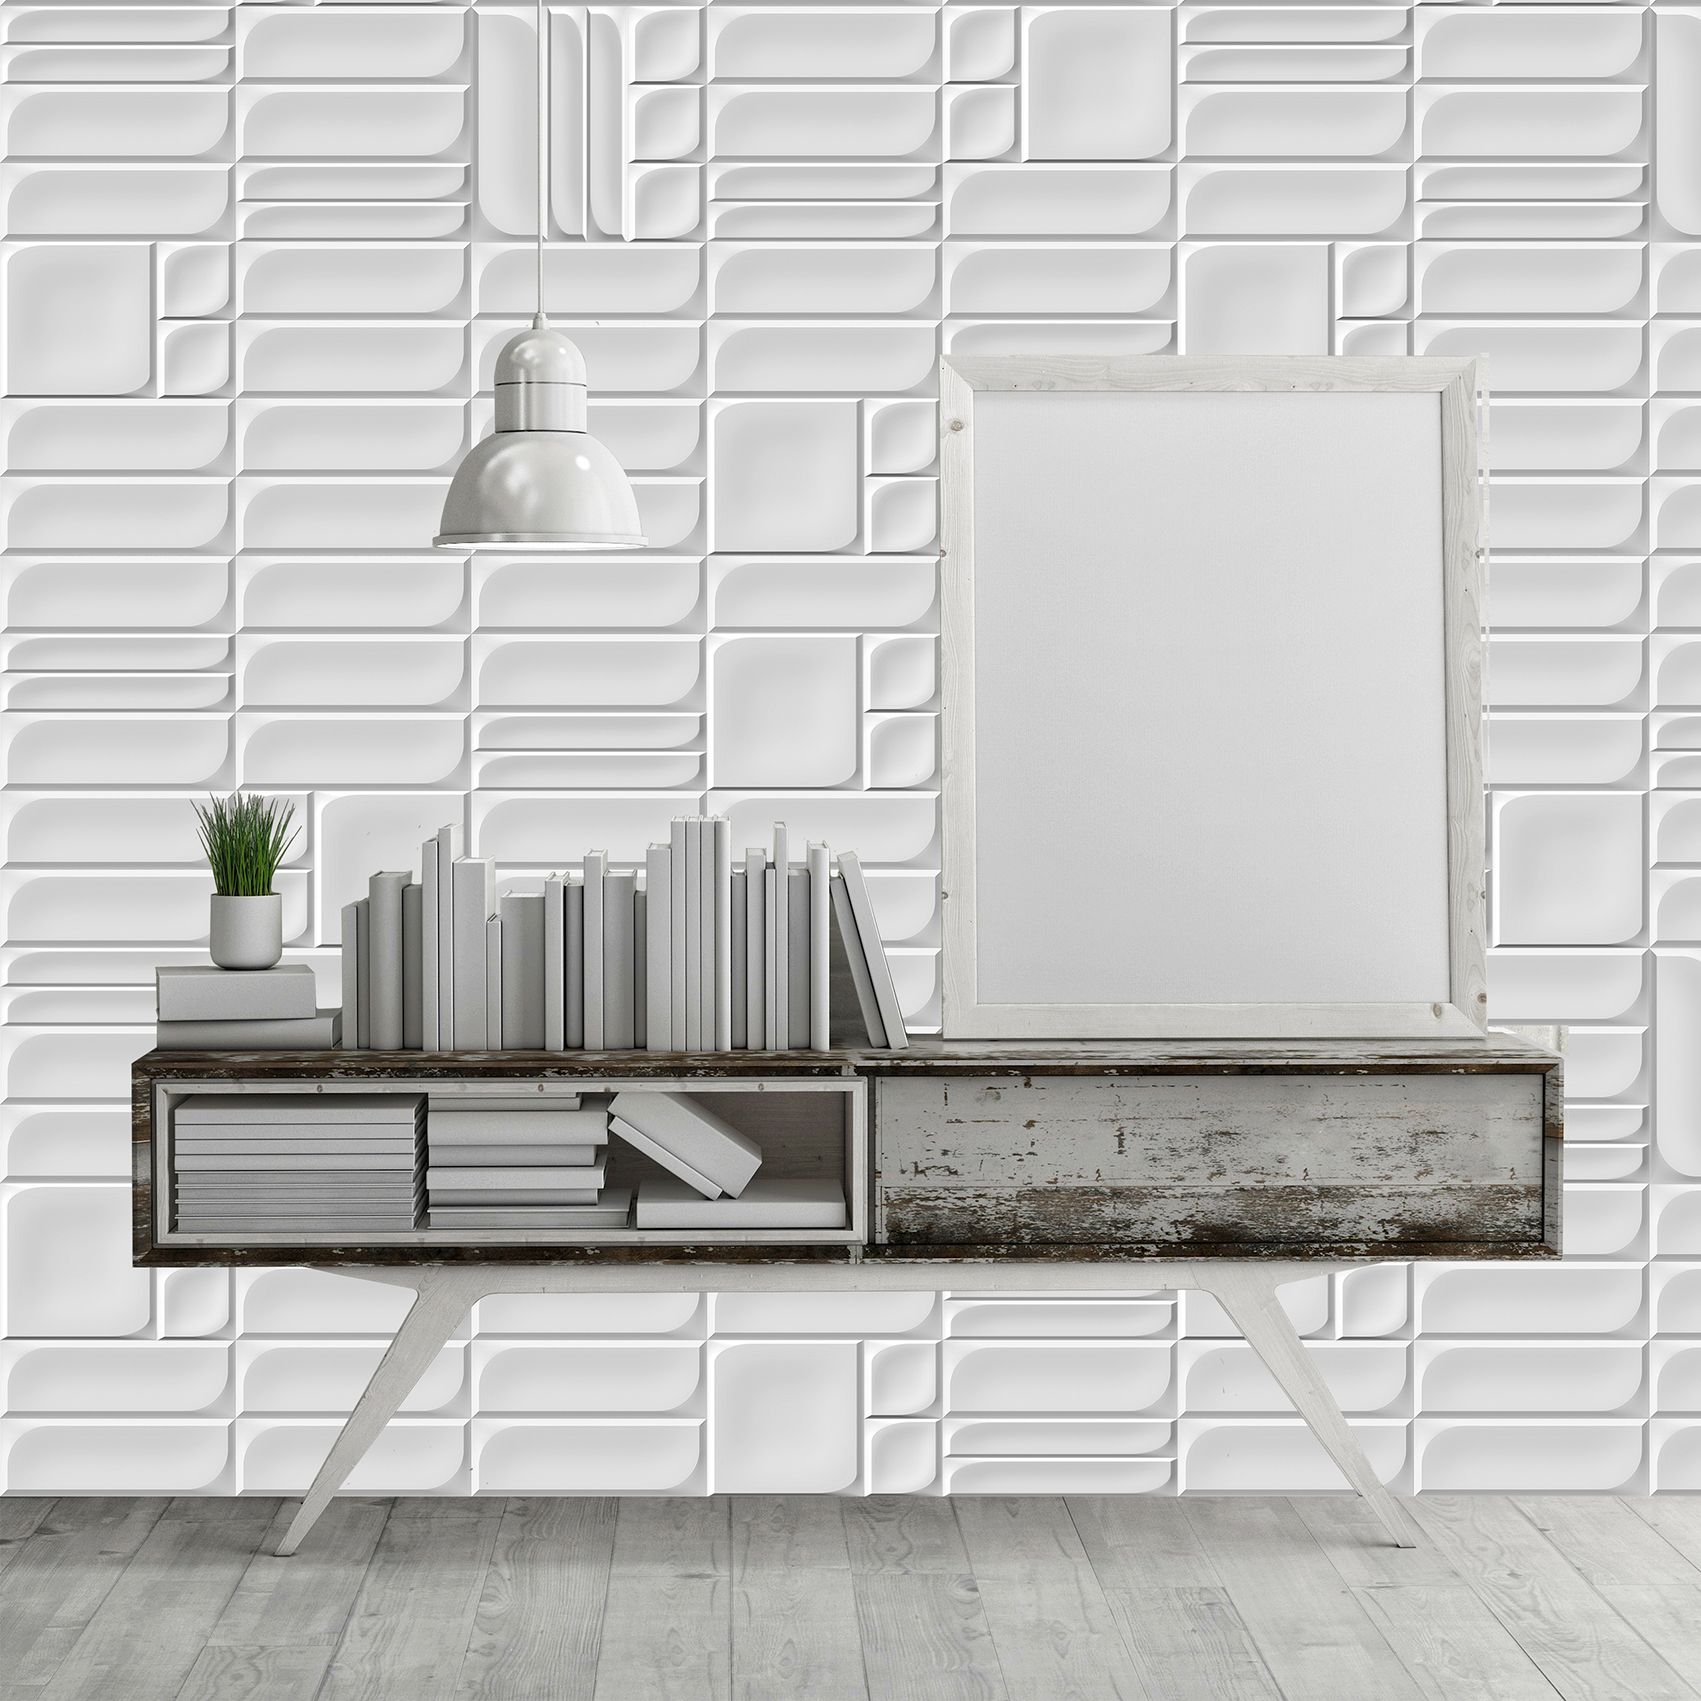 Ambient Ceramic Relief Modular In Colours White Ambiente Con Relieve Ceramico Modular En Colore Blanco